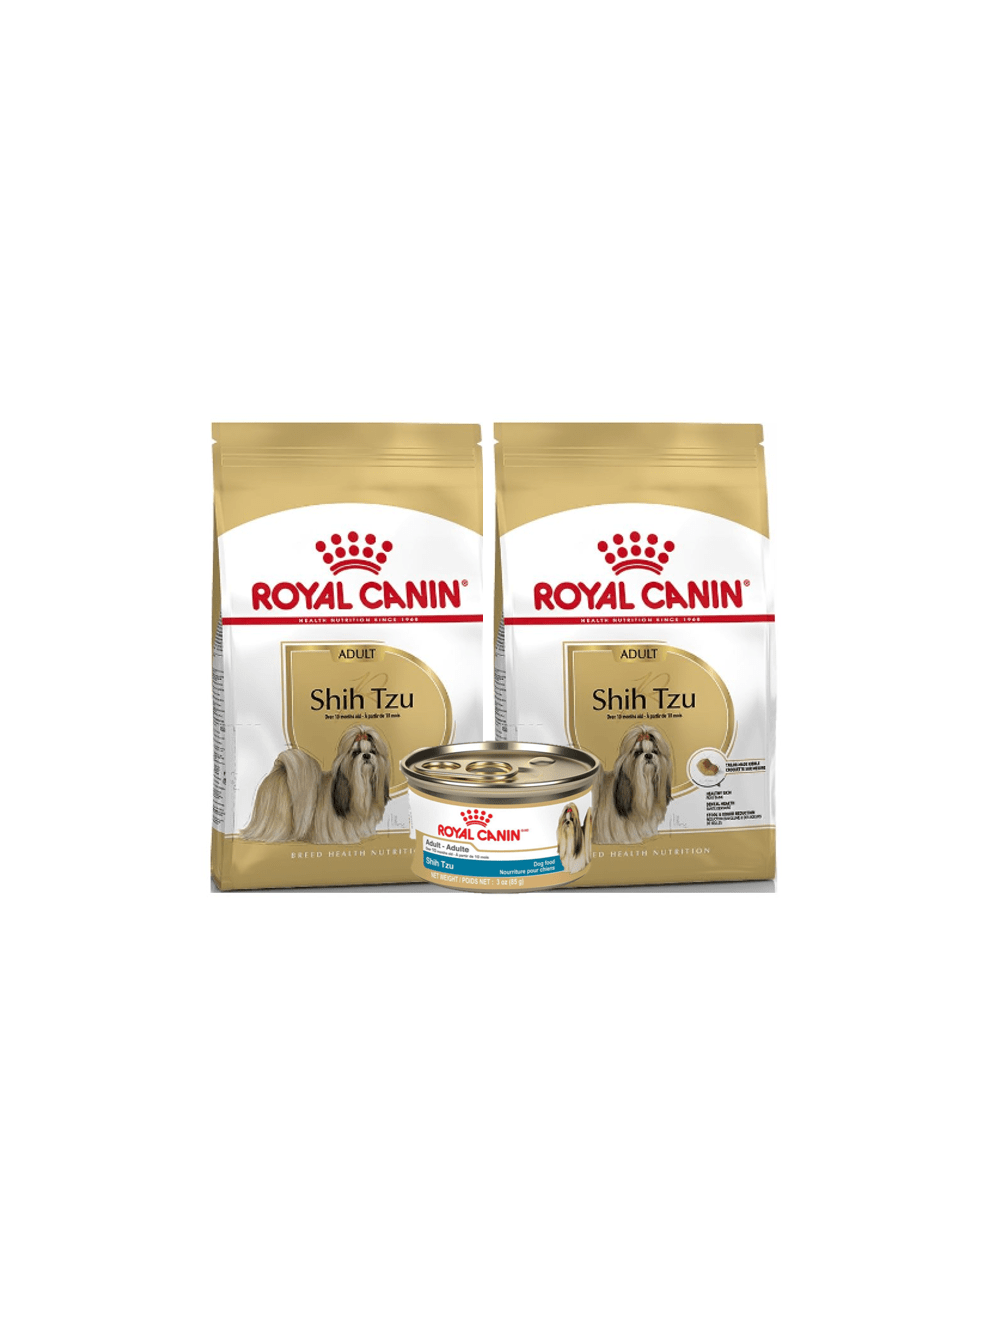 Royal Canin Shih Tzu Adulto 1.13 Kg Combo x 2 + Lata gratis